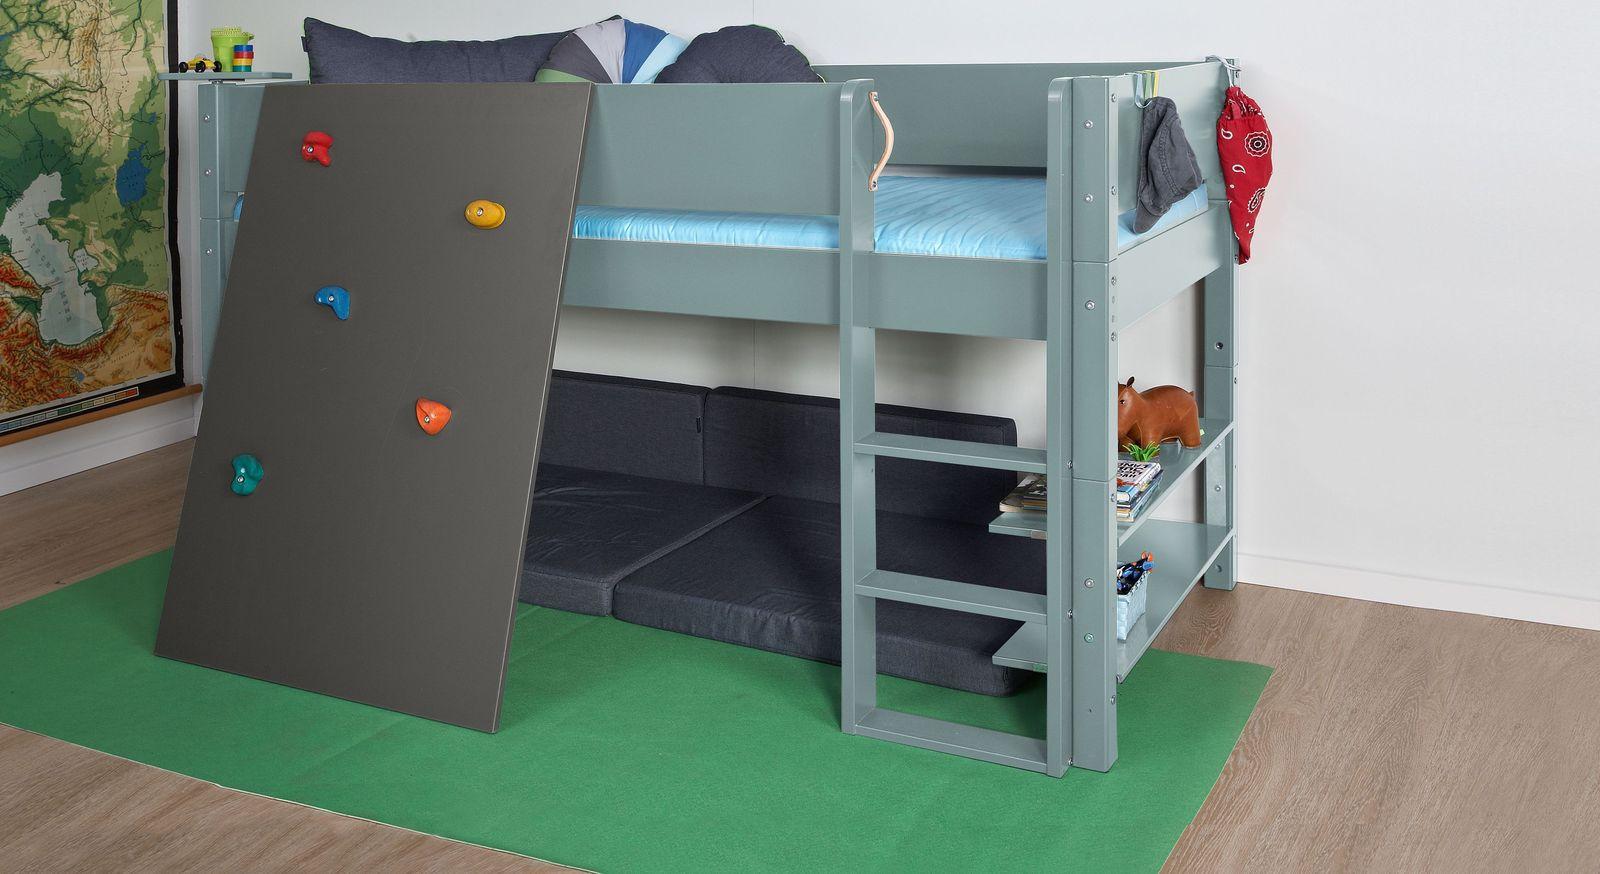 Sicheres Mini-Hochbett Kids Town Color mit anthrazitfarbener Kletterwand